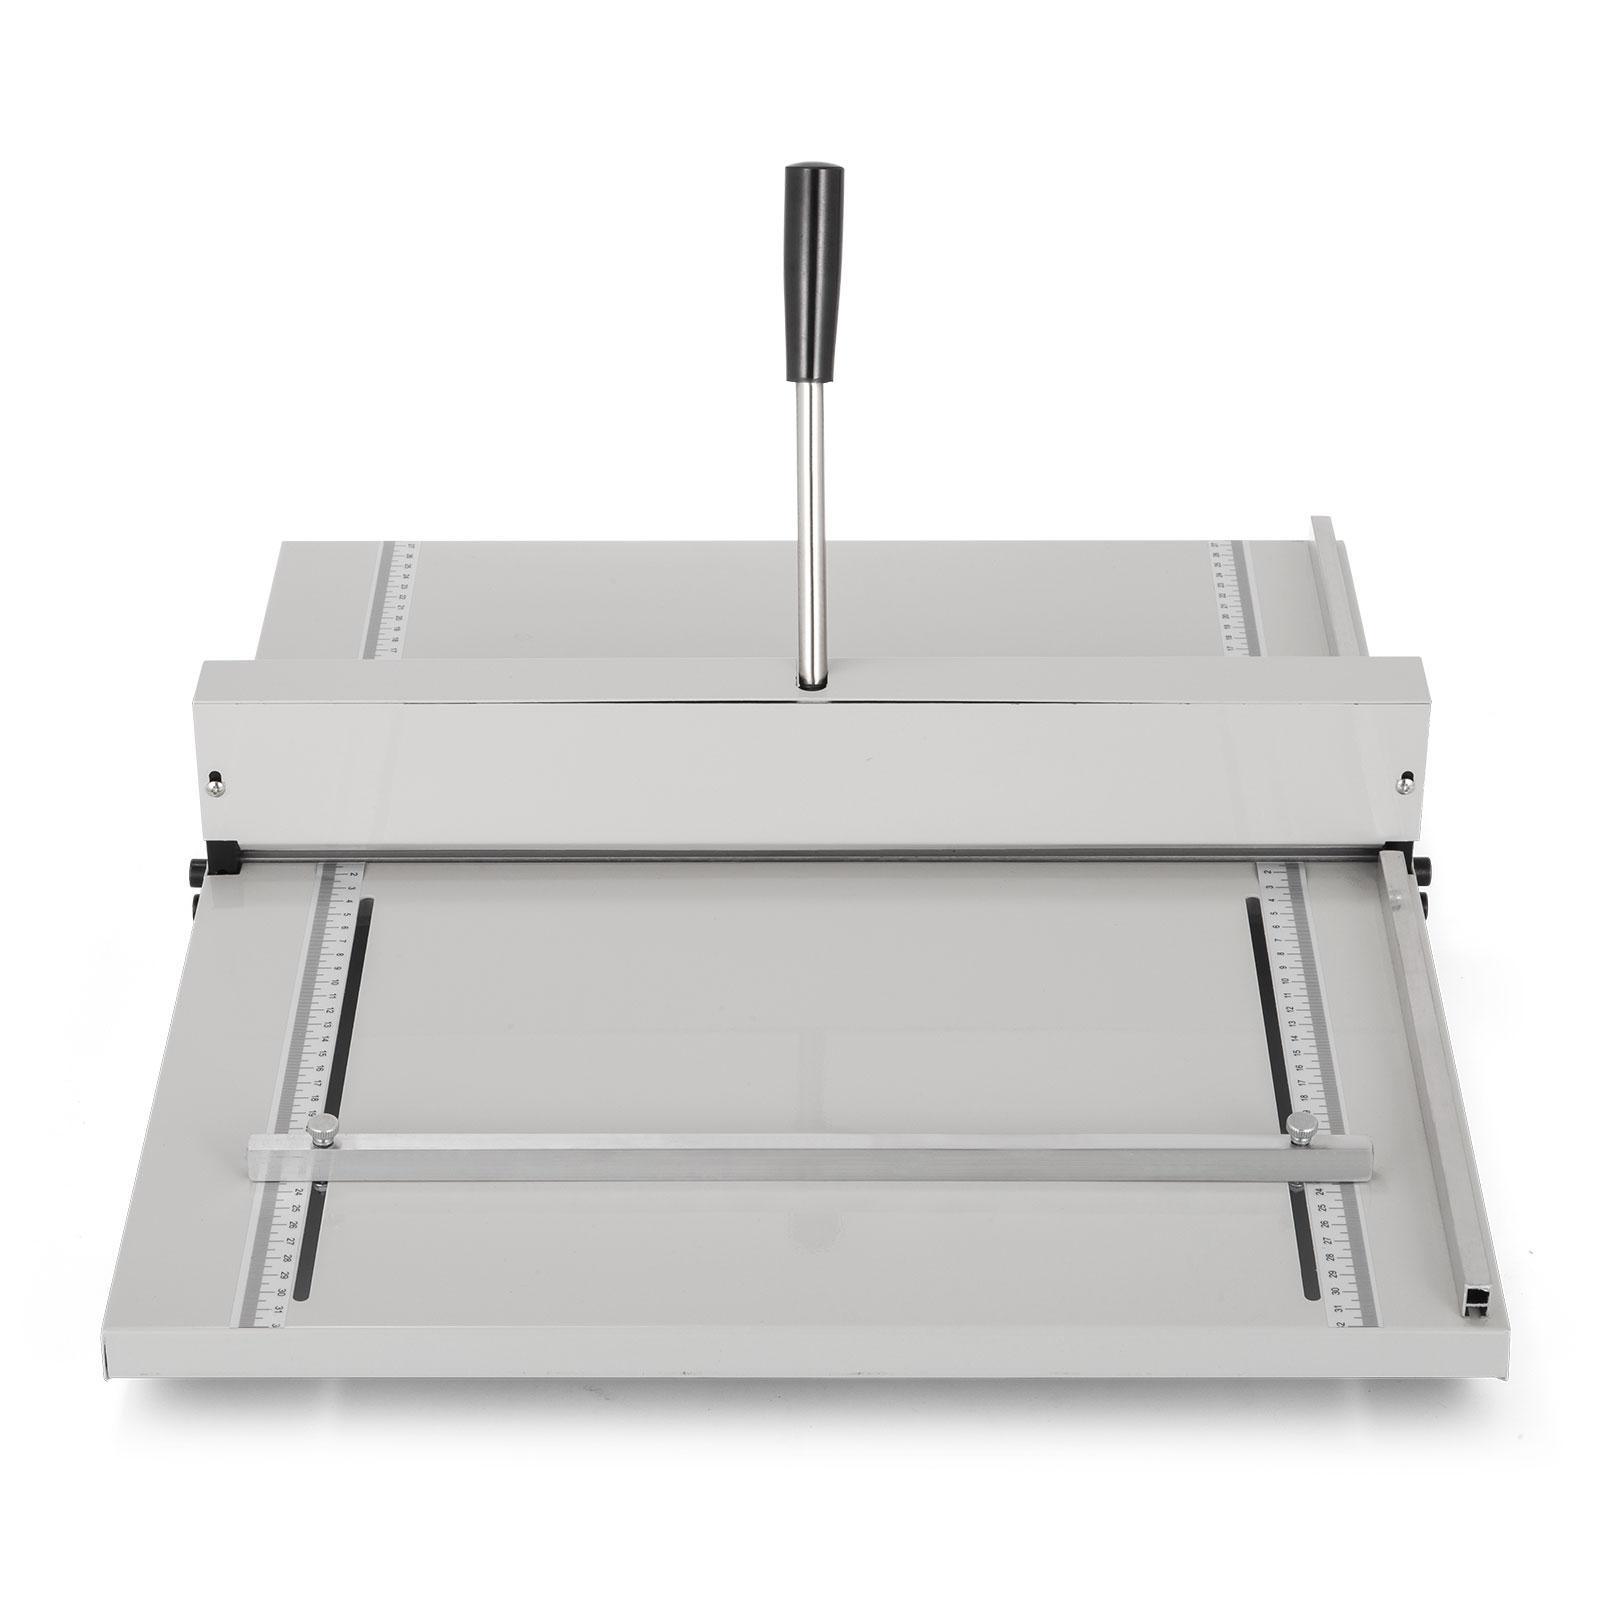 Cordonatrice-Perforatrice-Max-350-520mm-Profondita-Regolabile-Elettrica-Manuale miniatura 50